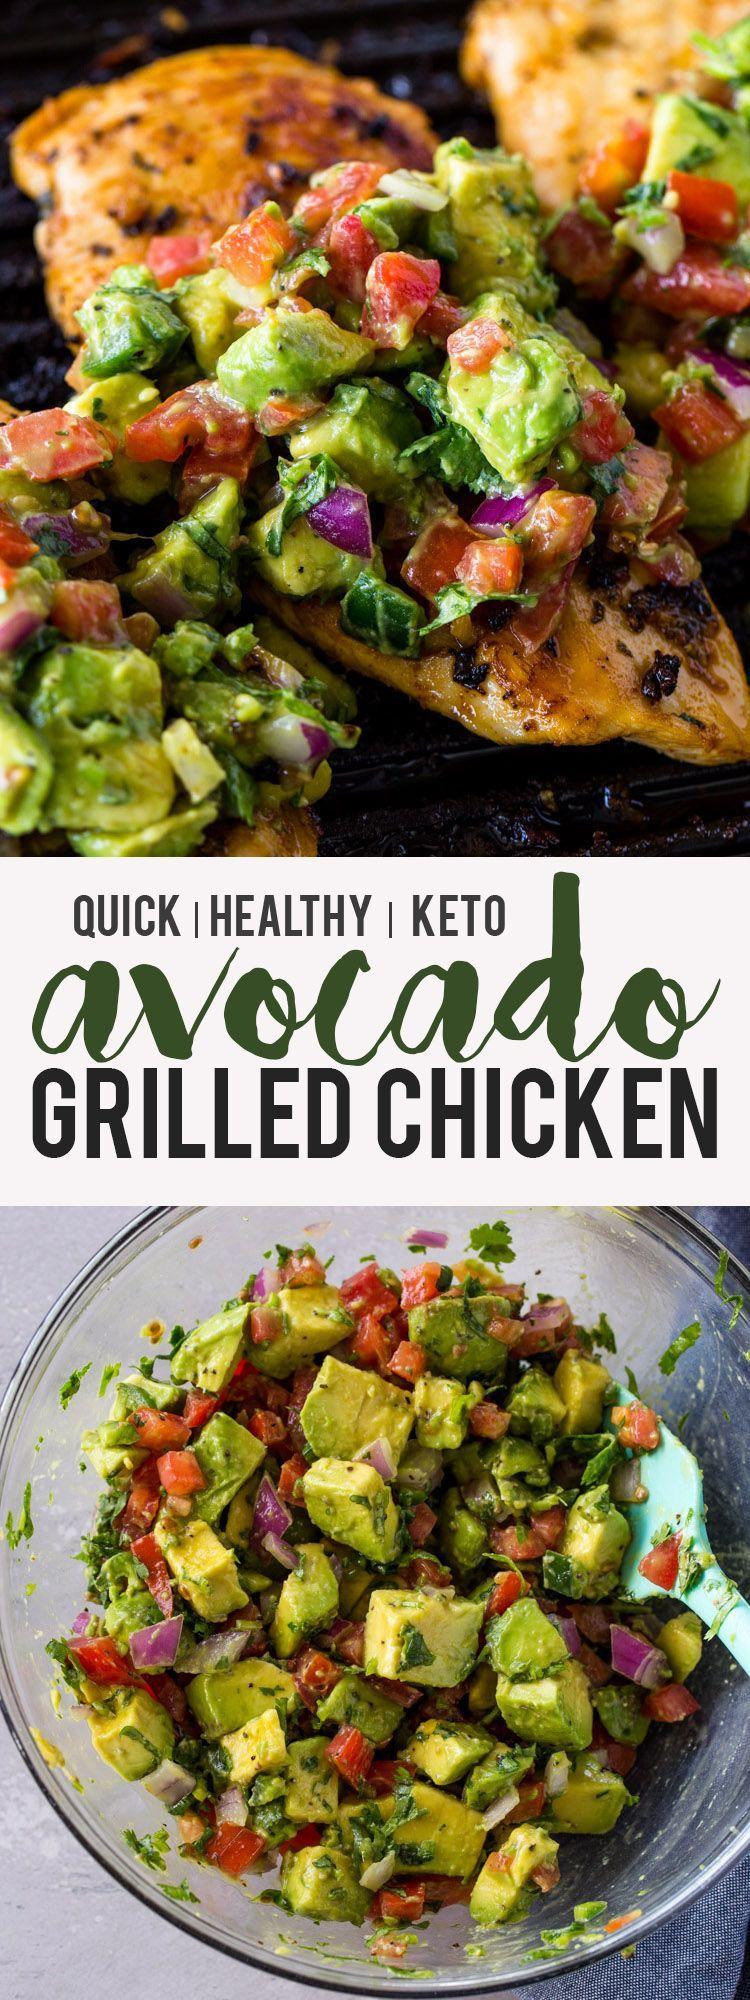 Gegrilltes Hähnchen mit Avocado-Salsa (Keto) - Low carb #avocado #rezept #avacadorezepte